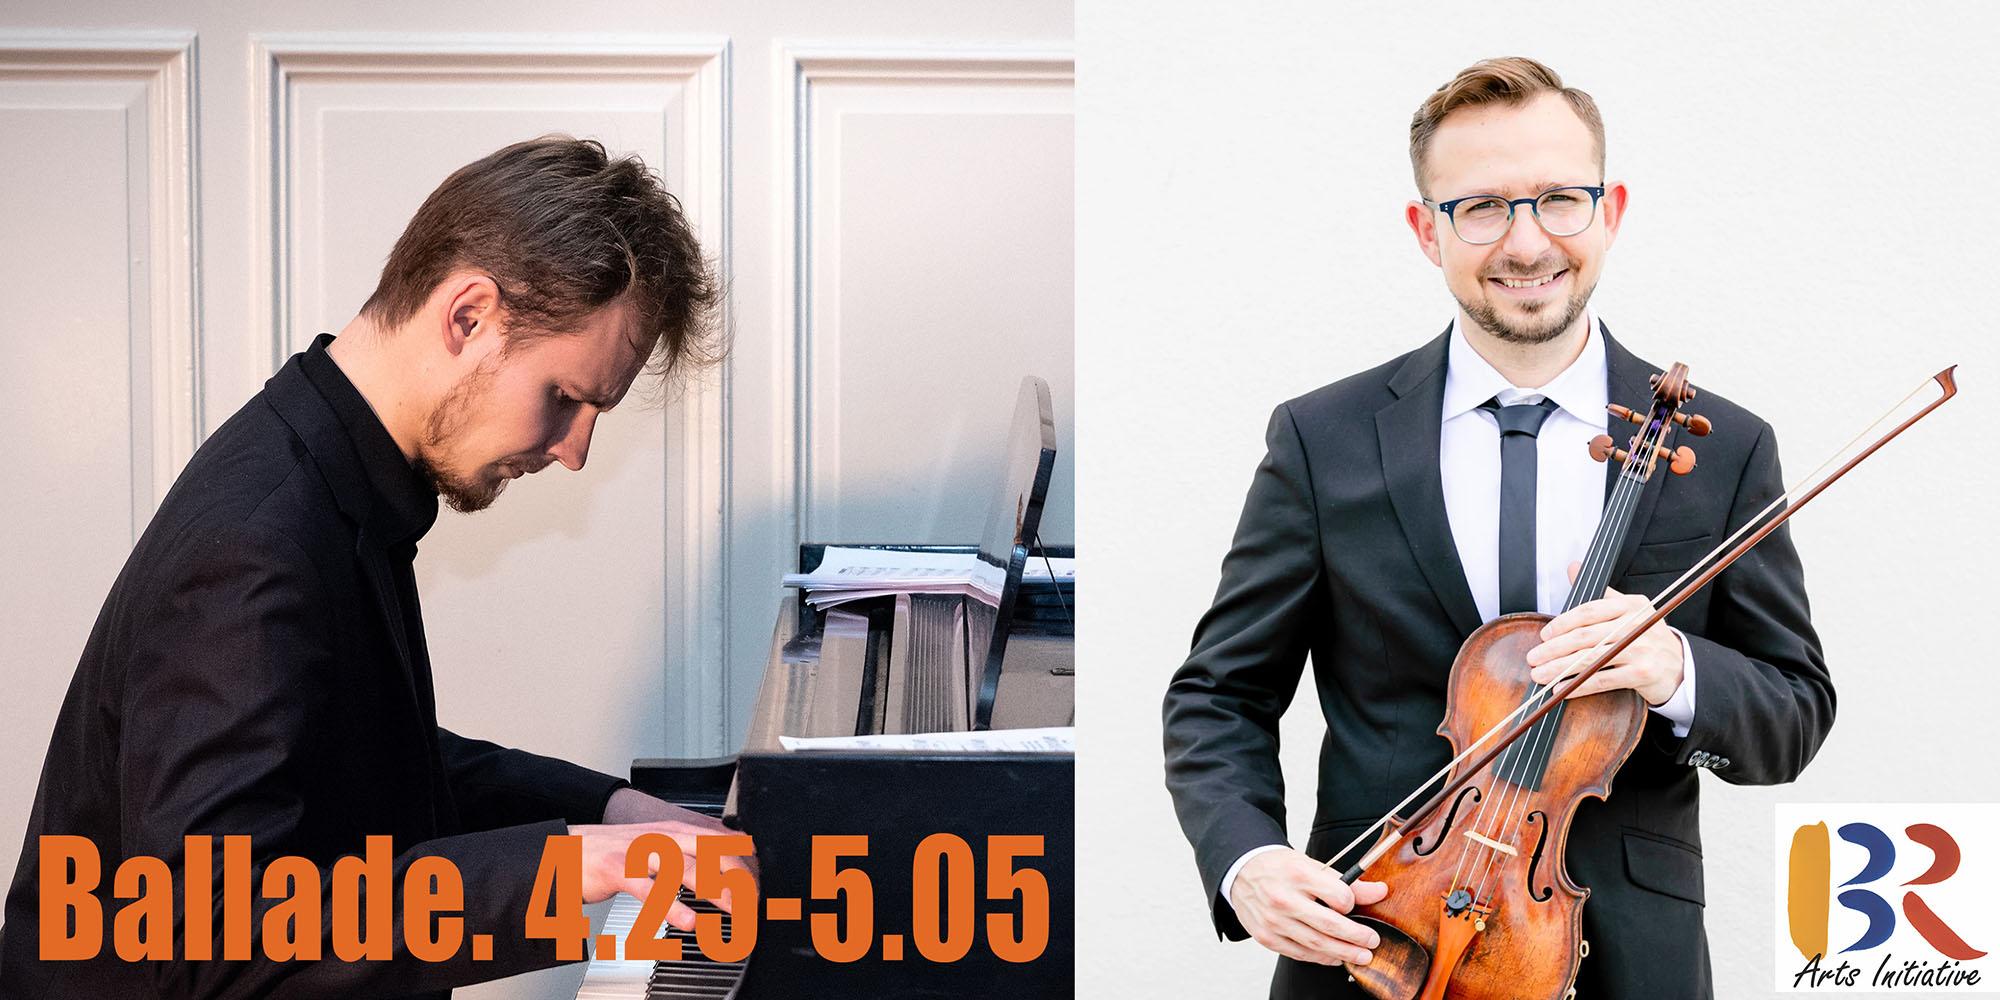 BALLADE: Violin and Piano Concert in memory of GORDON LANKTON